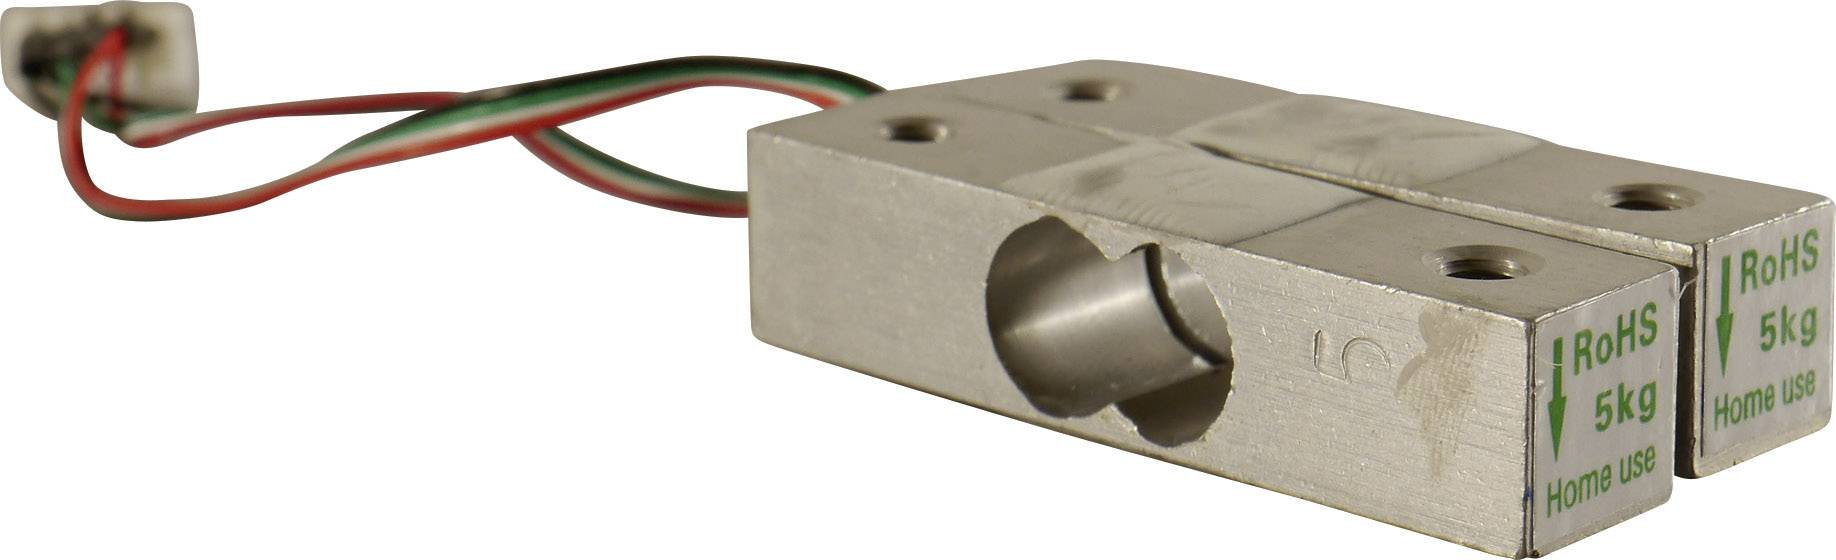 Dva senzory hmotnosti s konektorem pro Renkforce RF1000